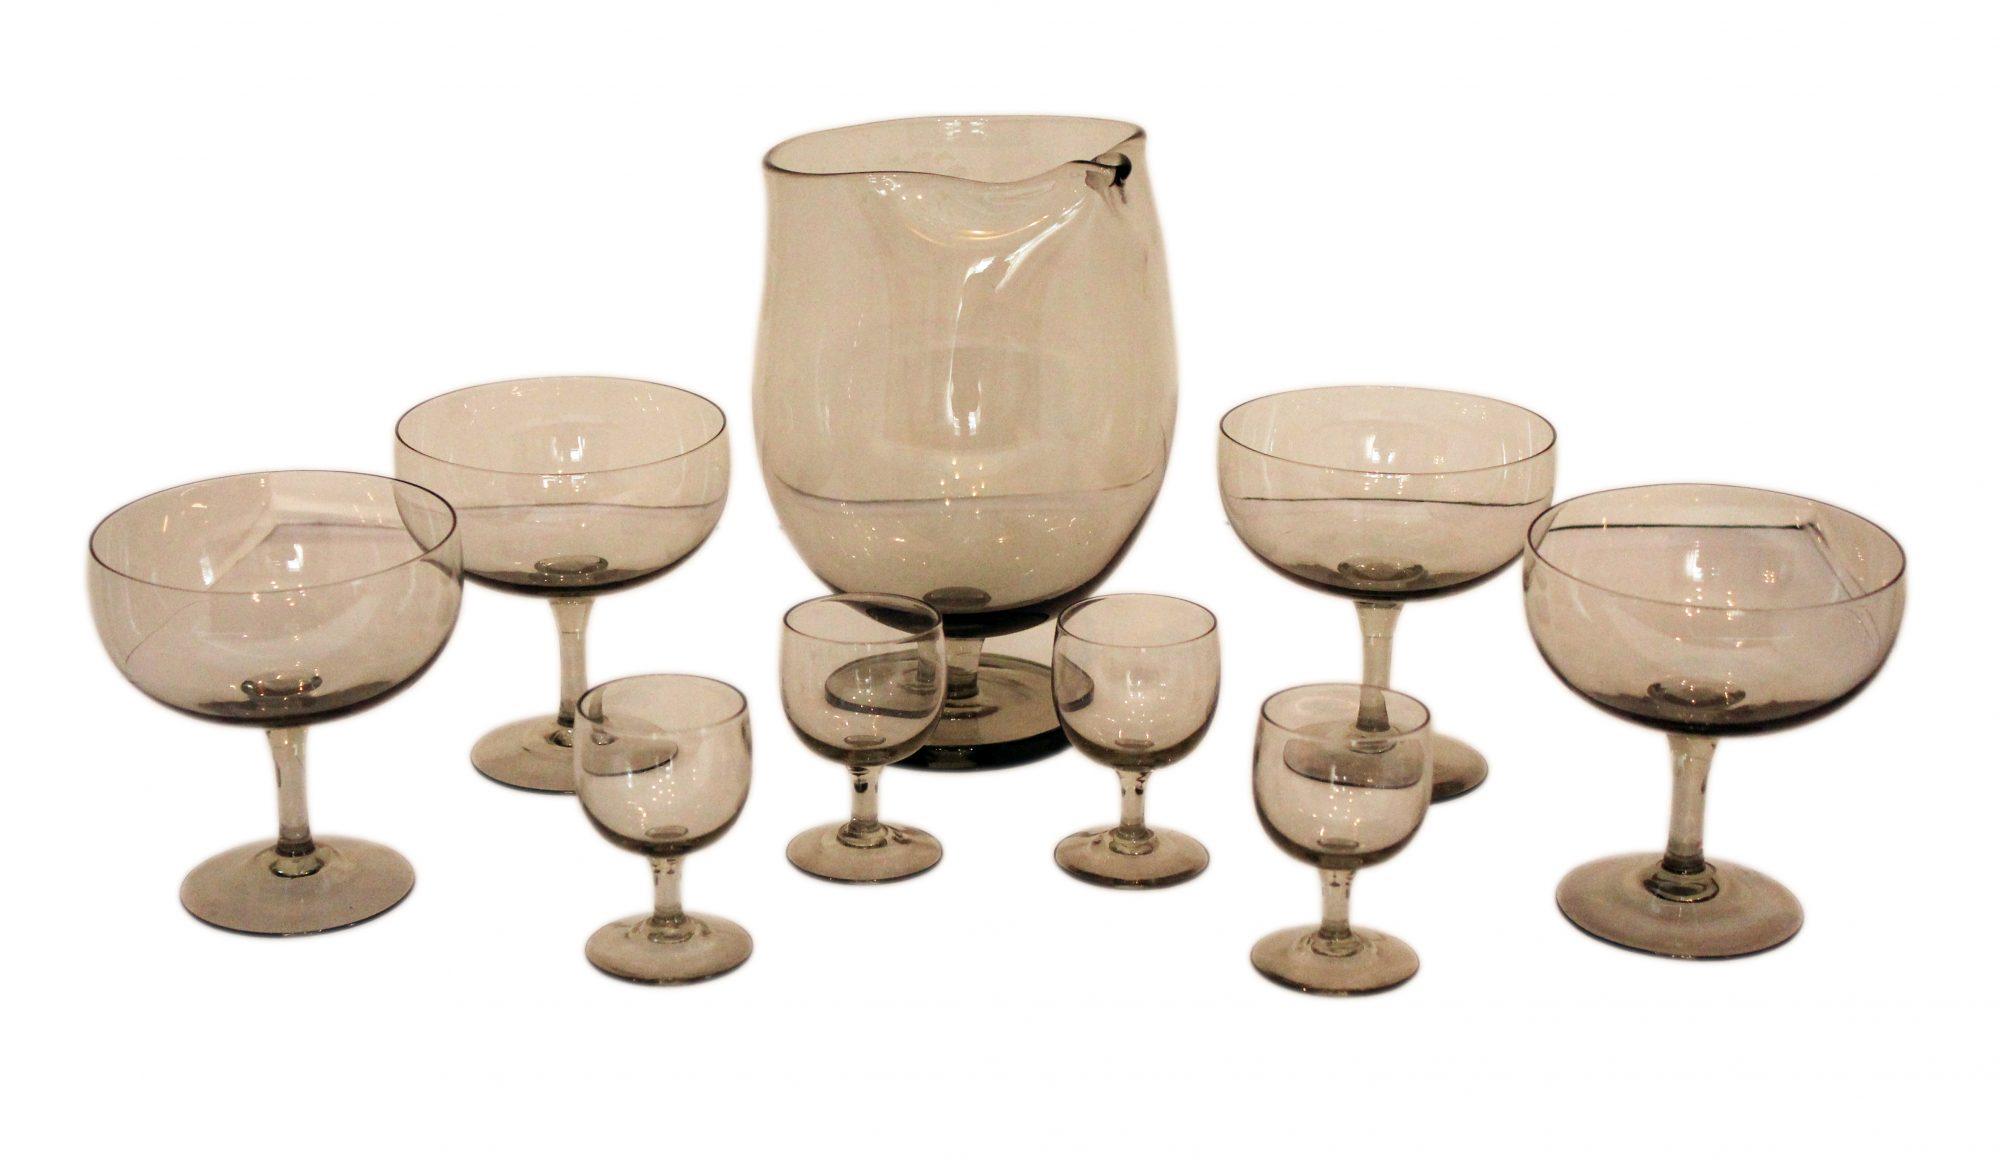 smoky grey pitcher & glasses